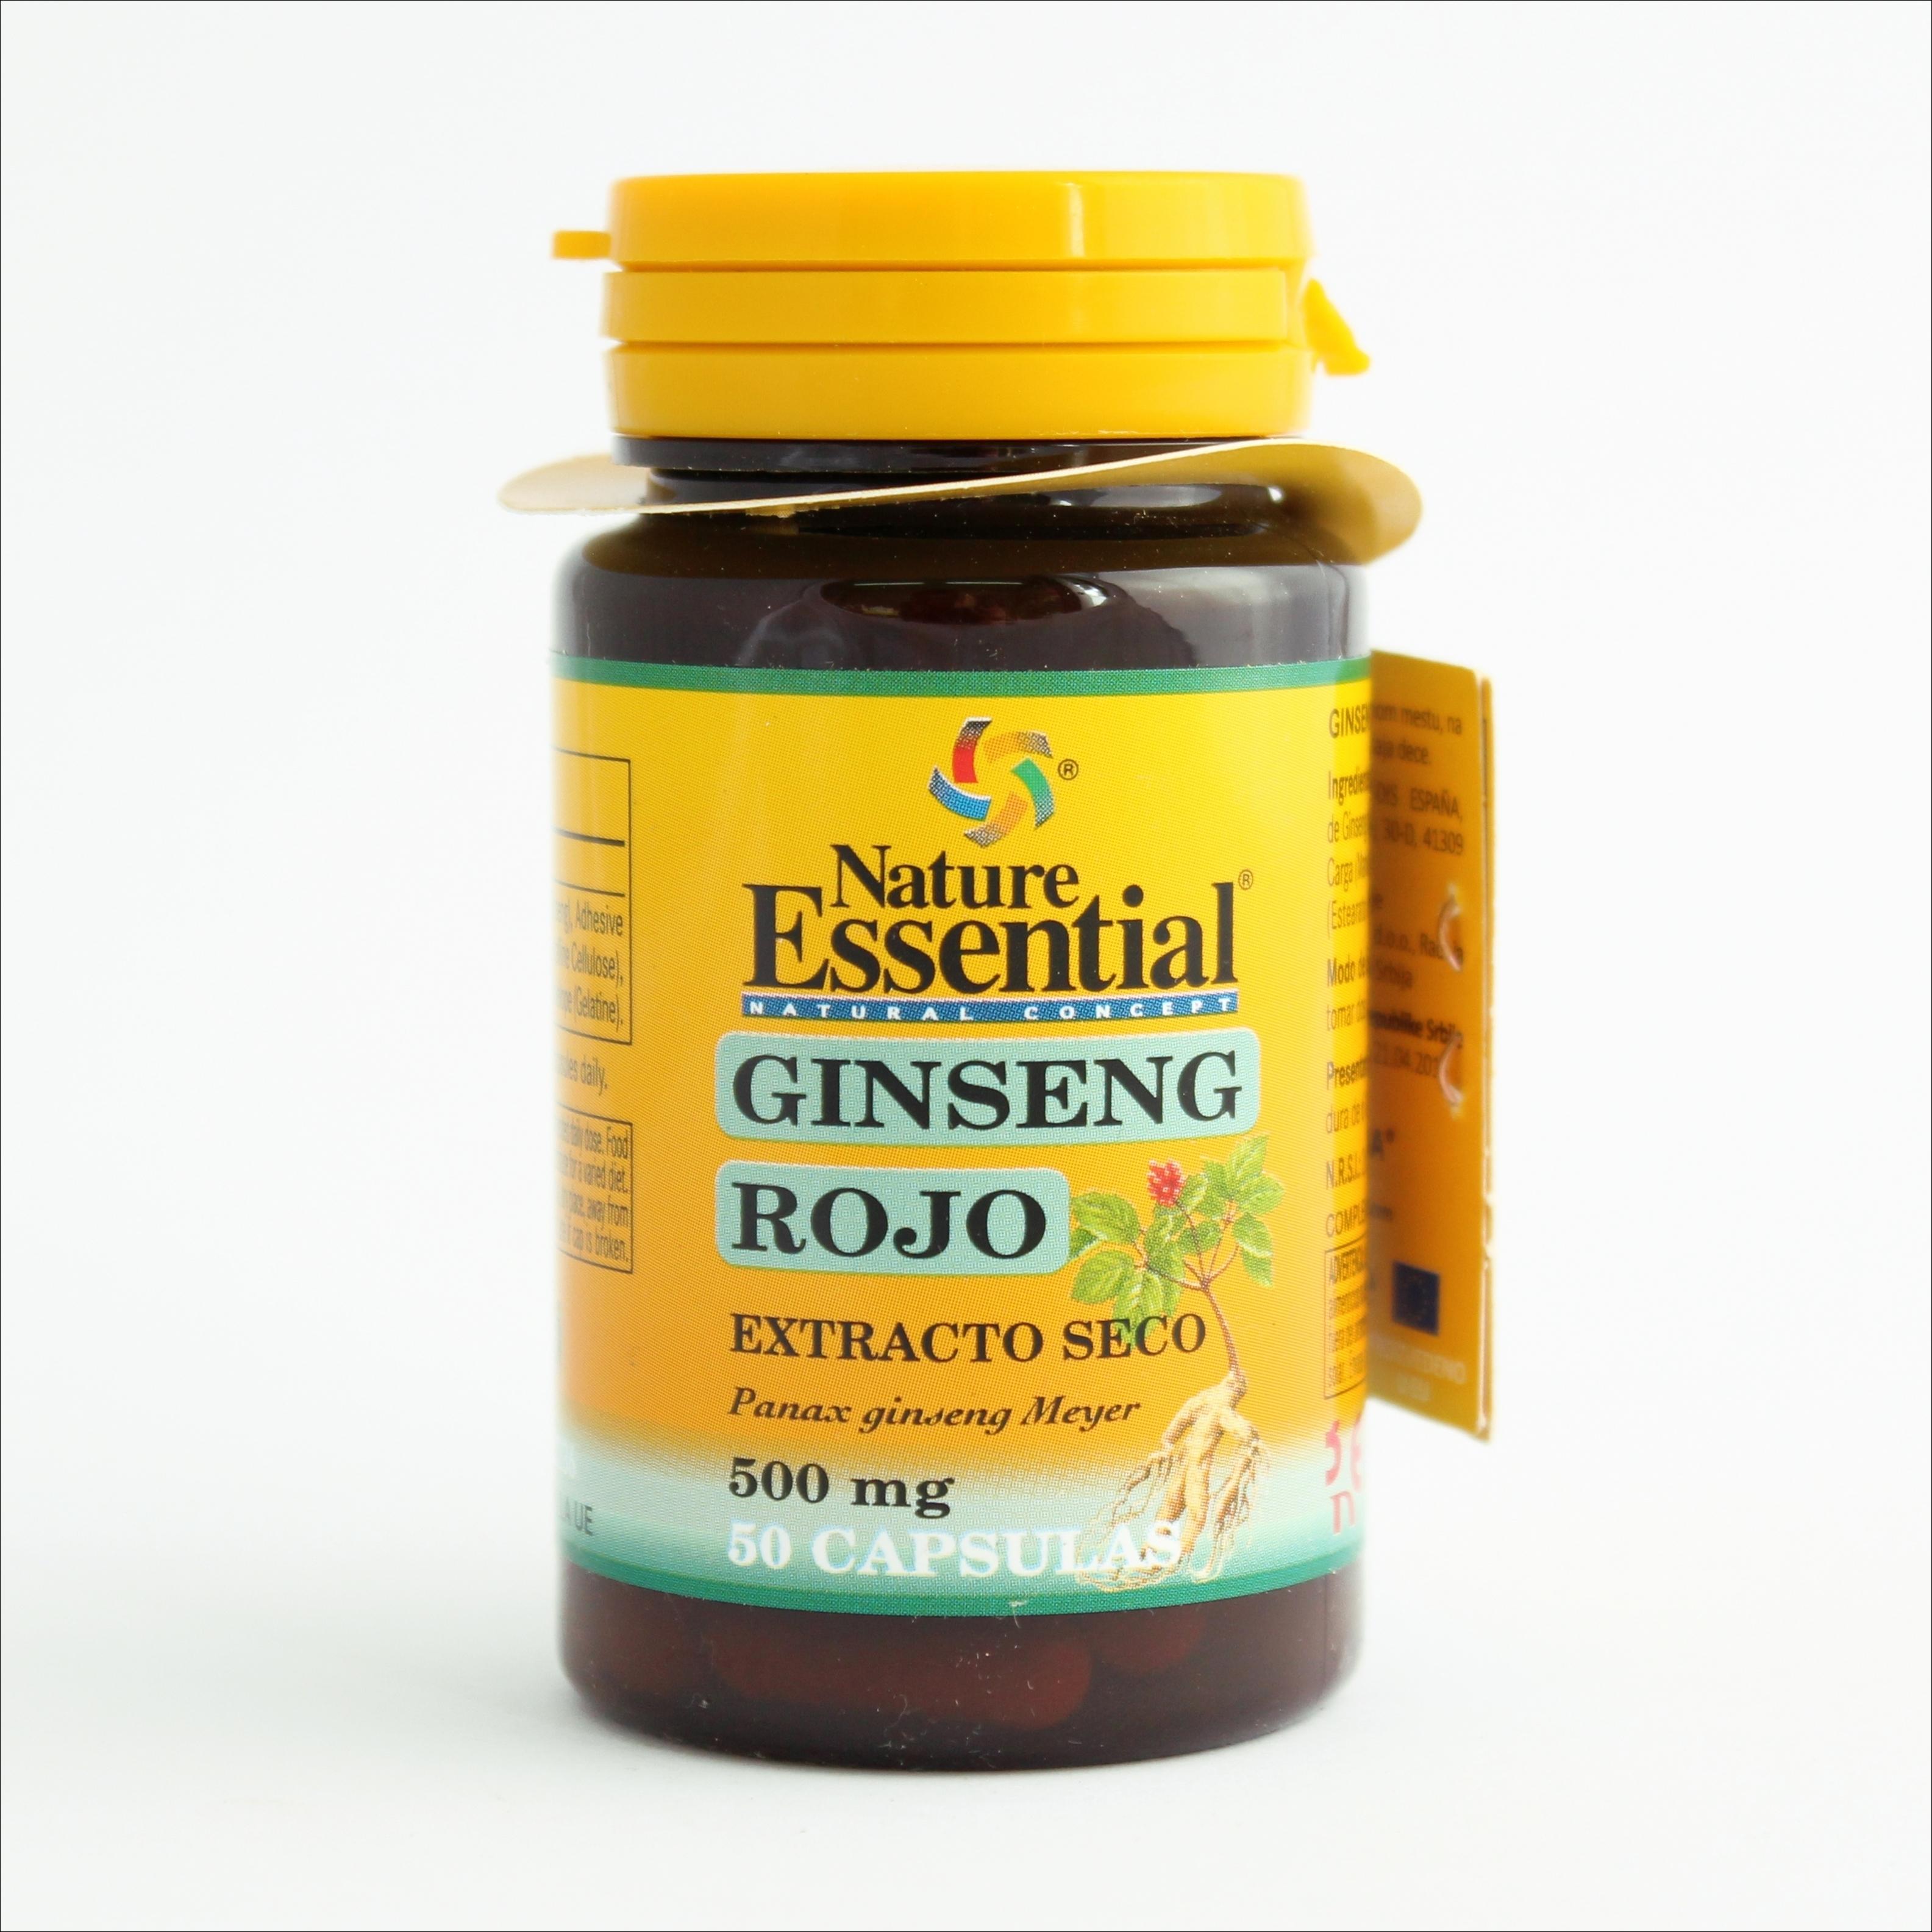 NE žen-šen 500 mg - 50 kapsula 00139